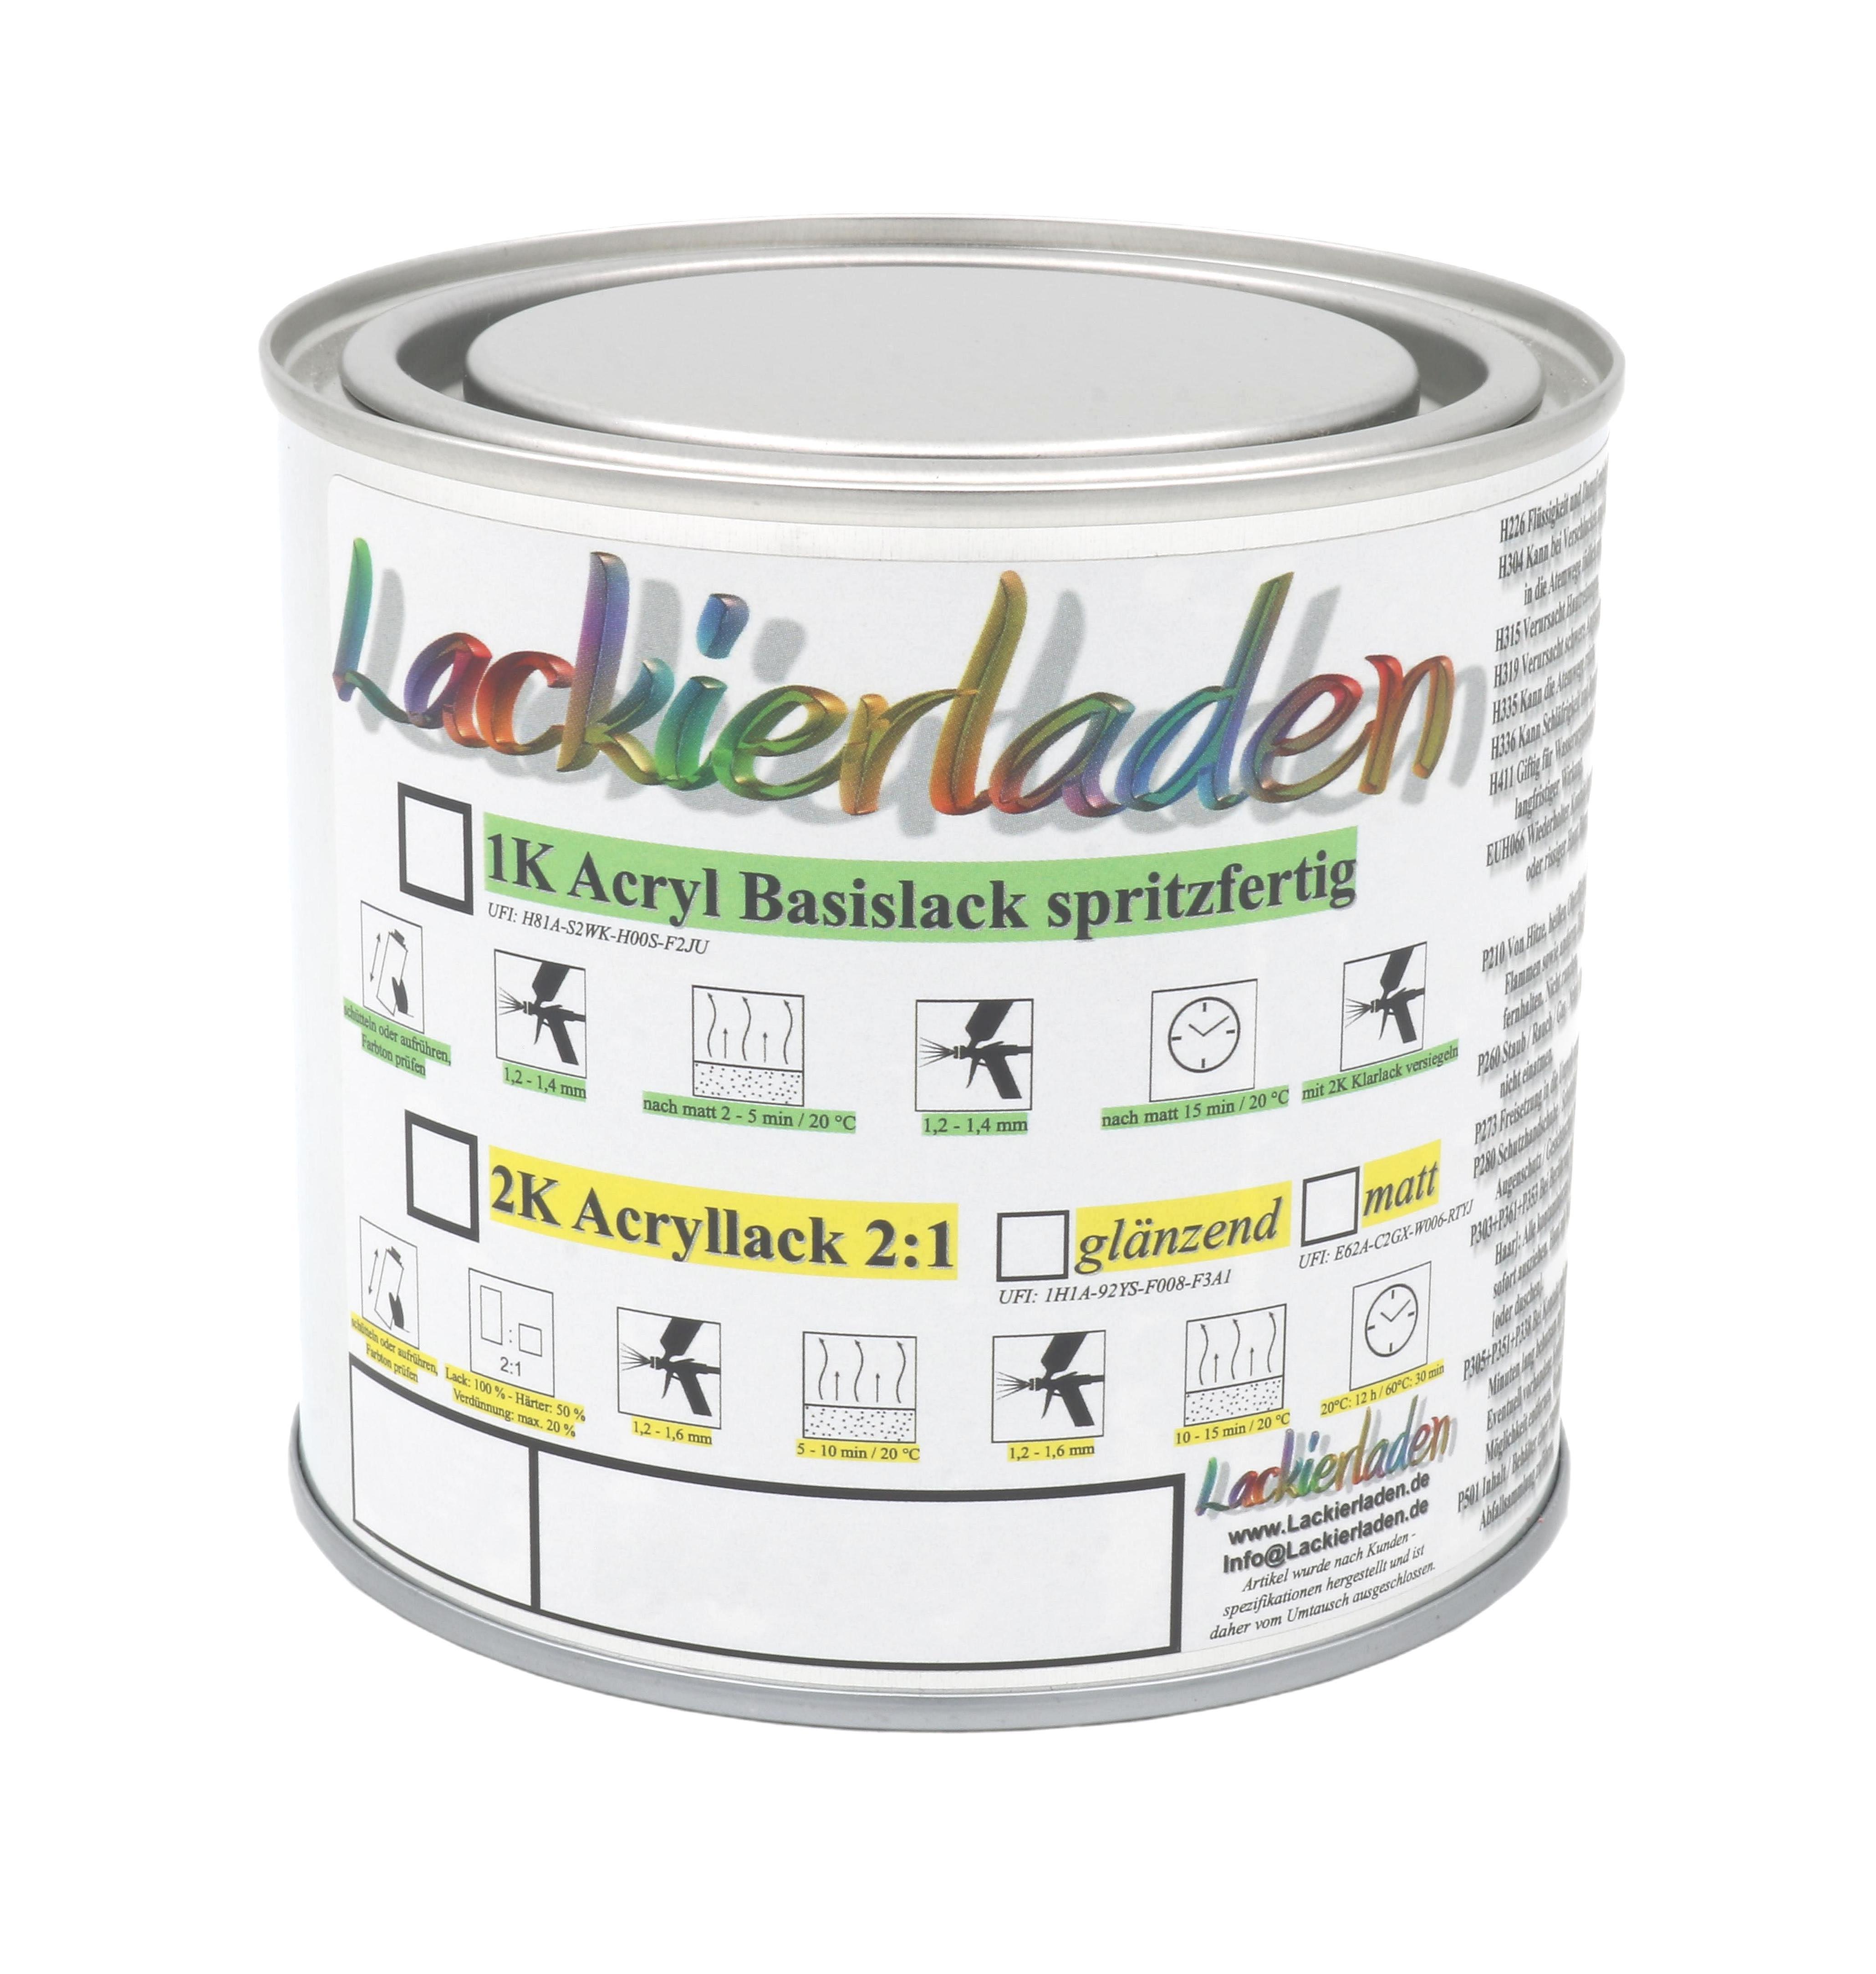 1K Acryl Basis 0,5 Liter spritzfertig Autolack